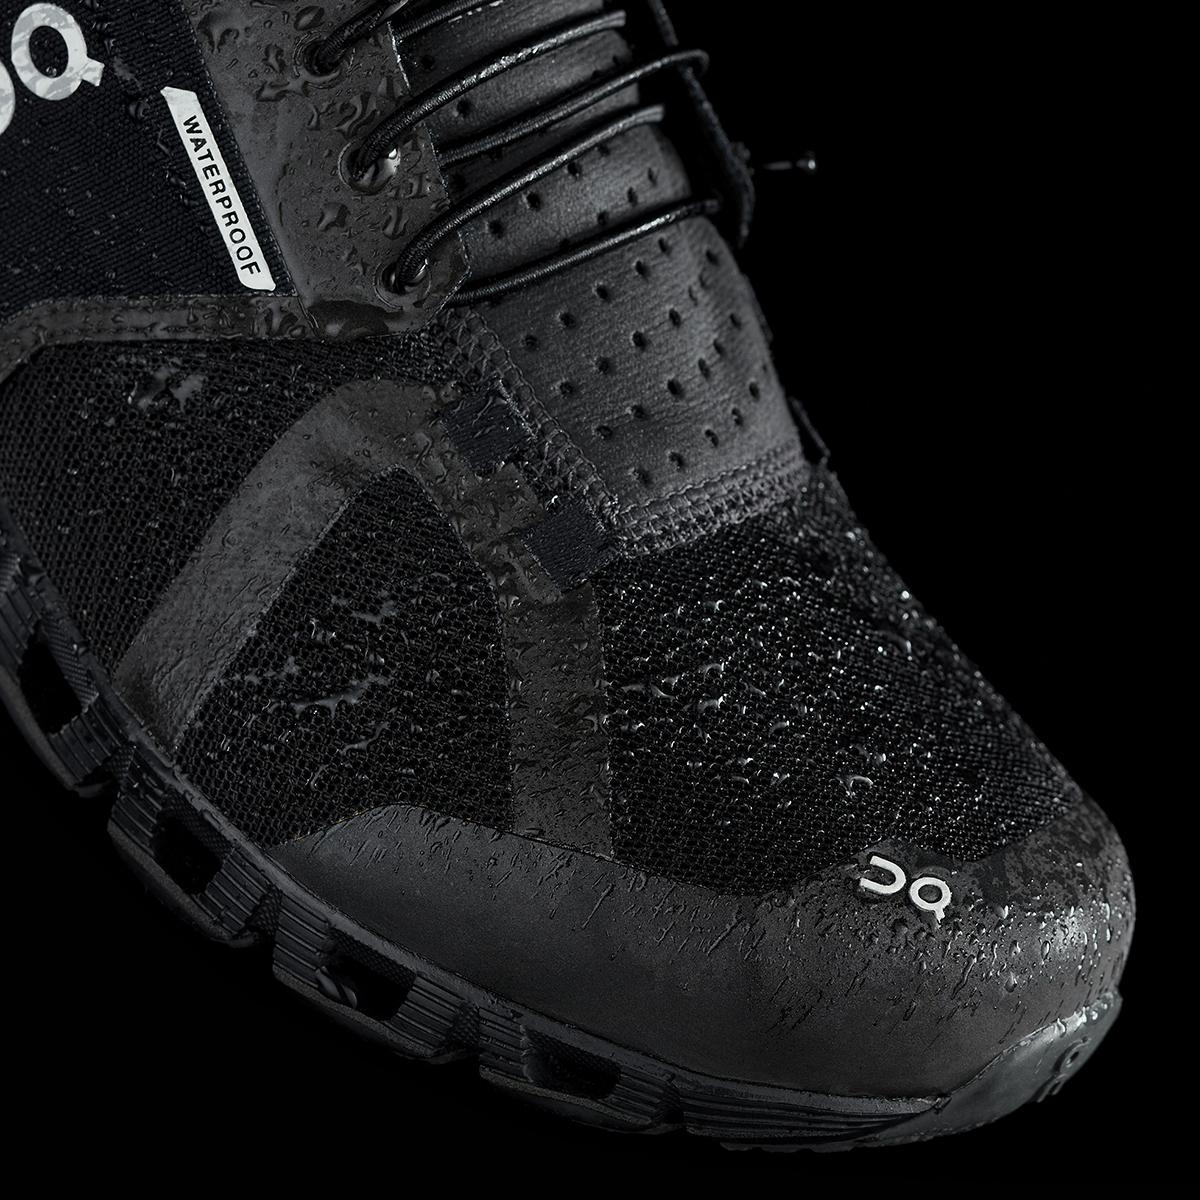 8080150d ON Кроссовки женские Cloud Waterproof Black / Lunar Артикул: 000019.99986